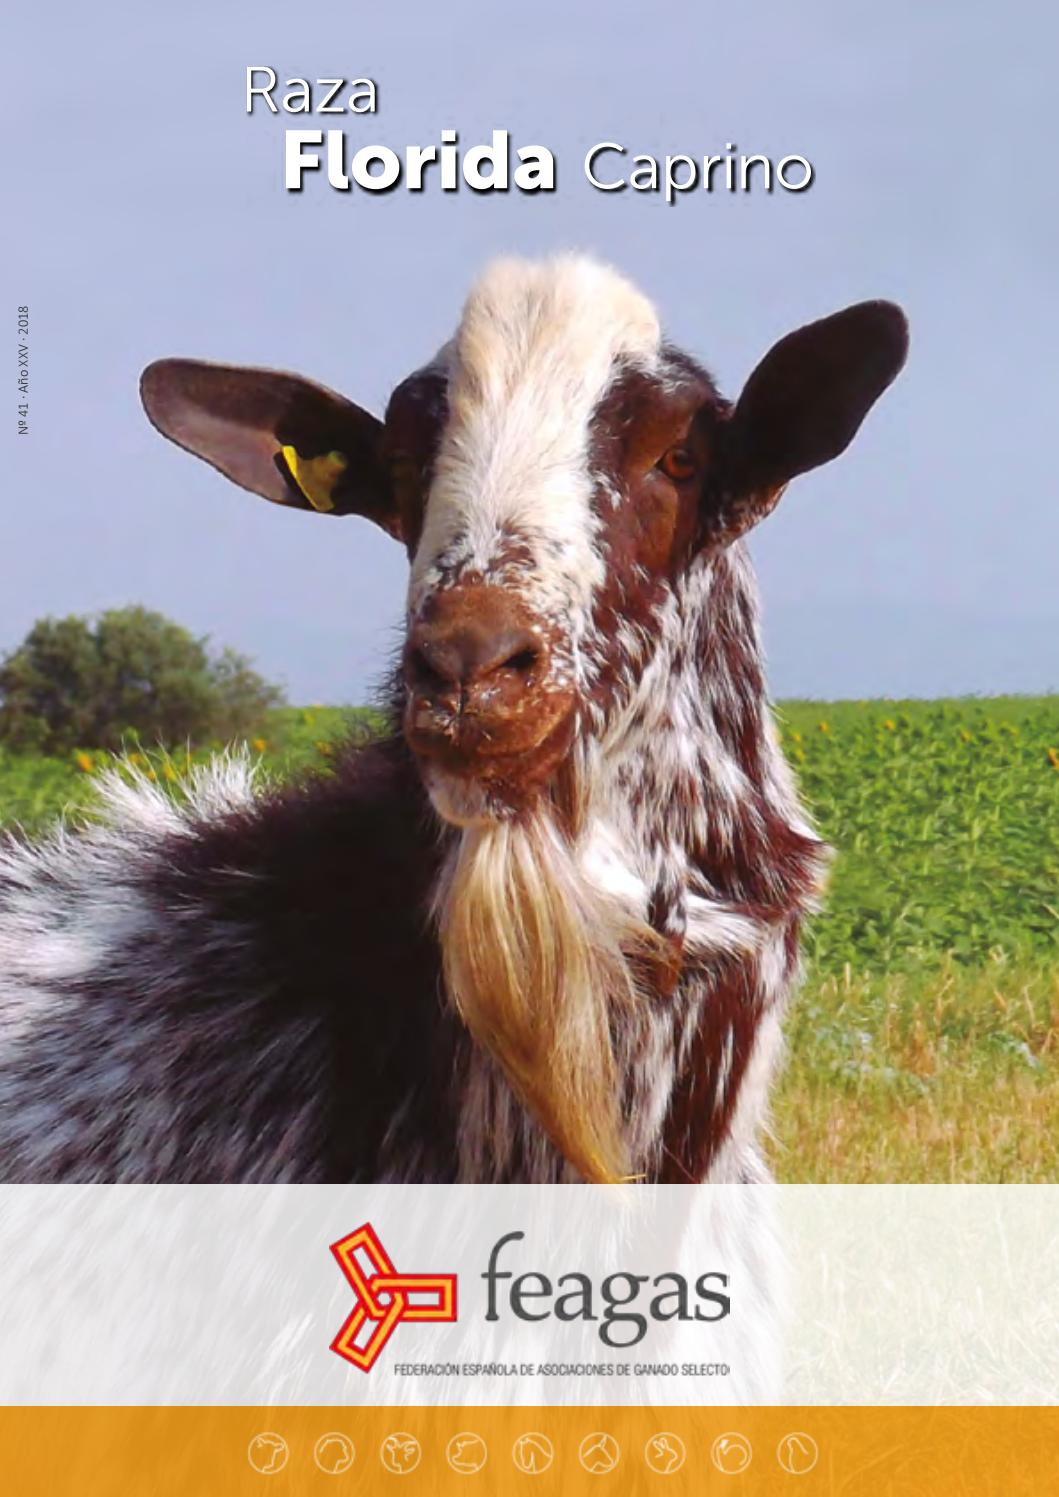 Collar de divulgación de ganado Etiqueta Vegano